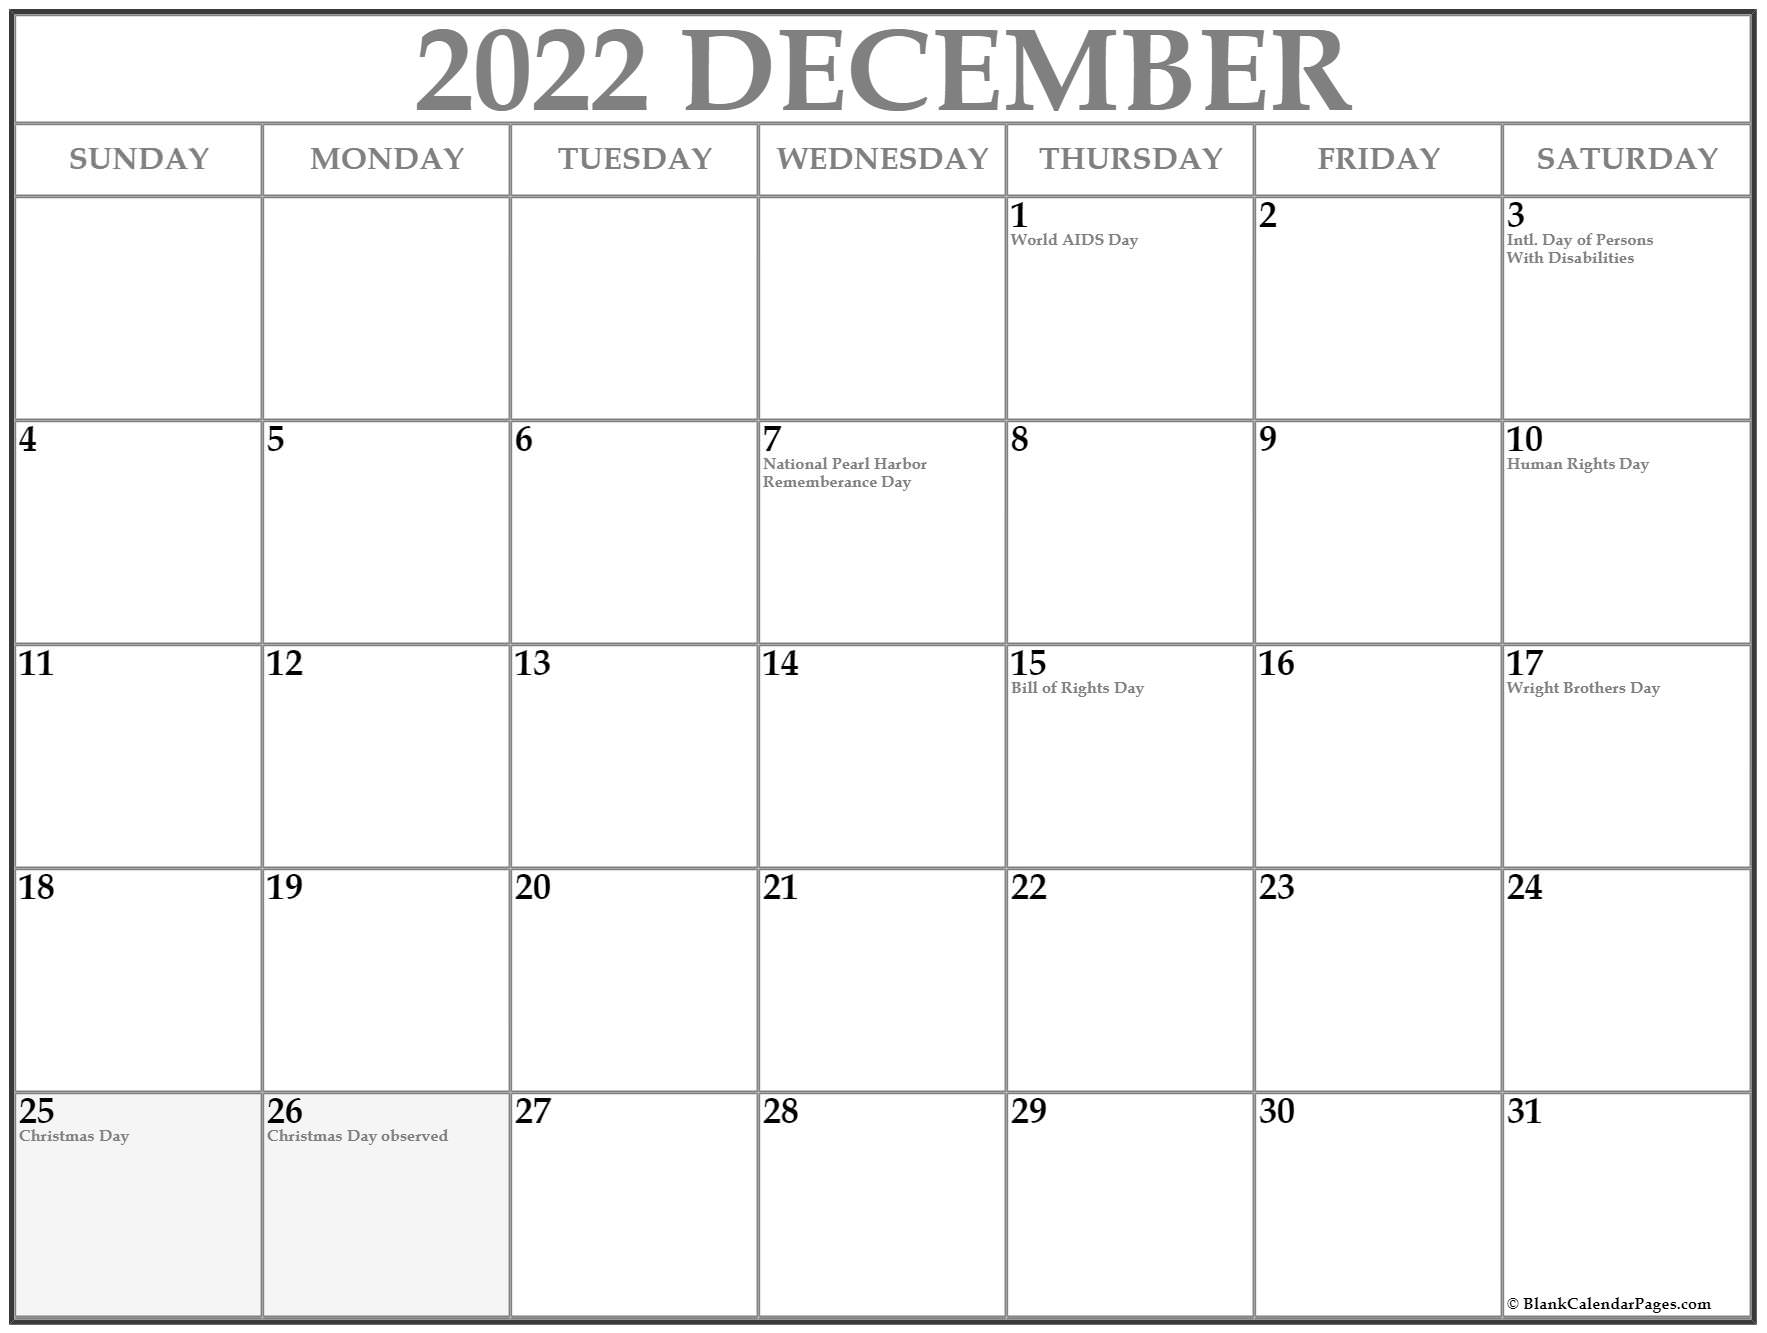 December calendar USA